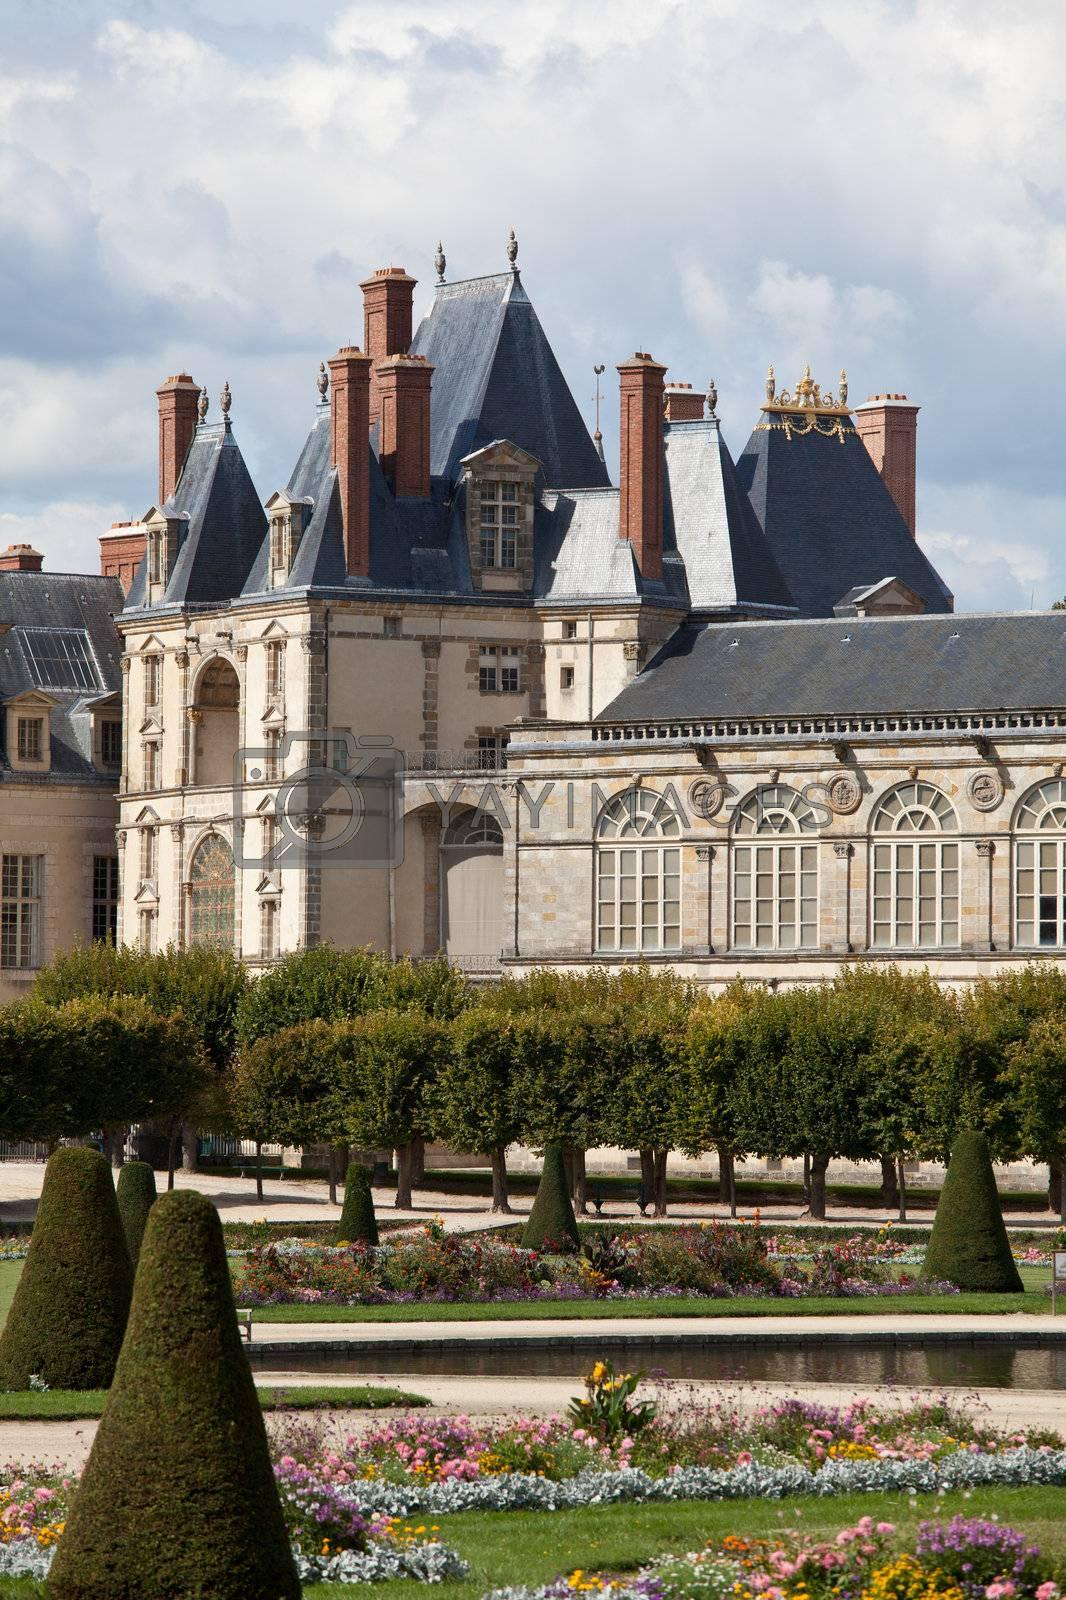 Medieval royal castle Fontainbleau near Paris in France and gard by SergeyAK